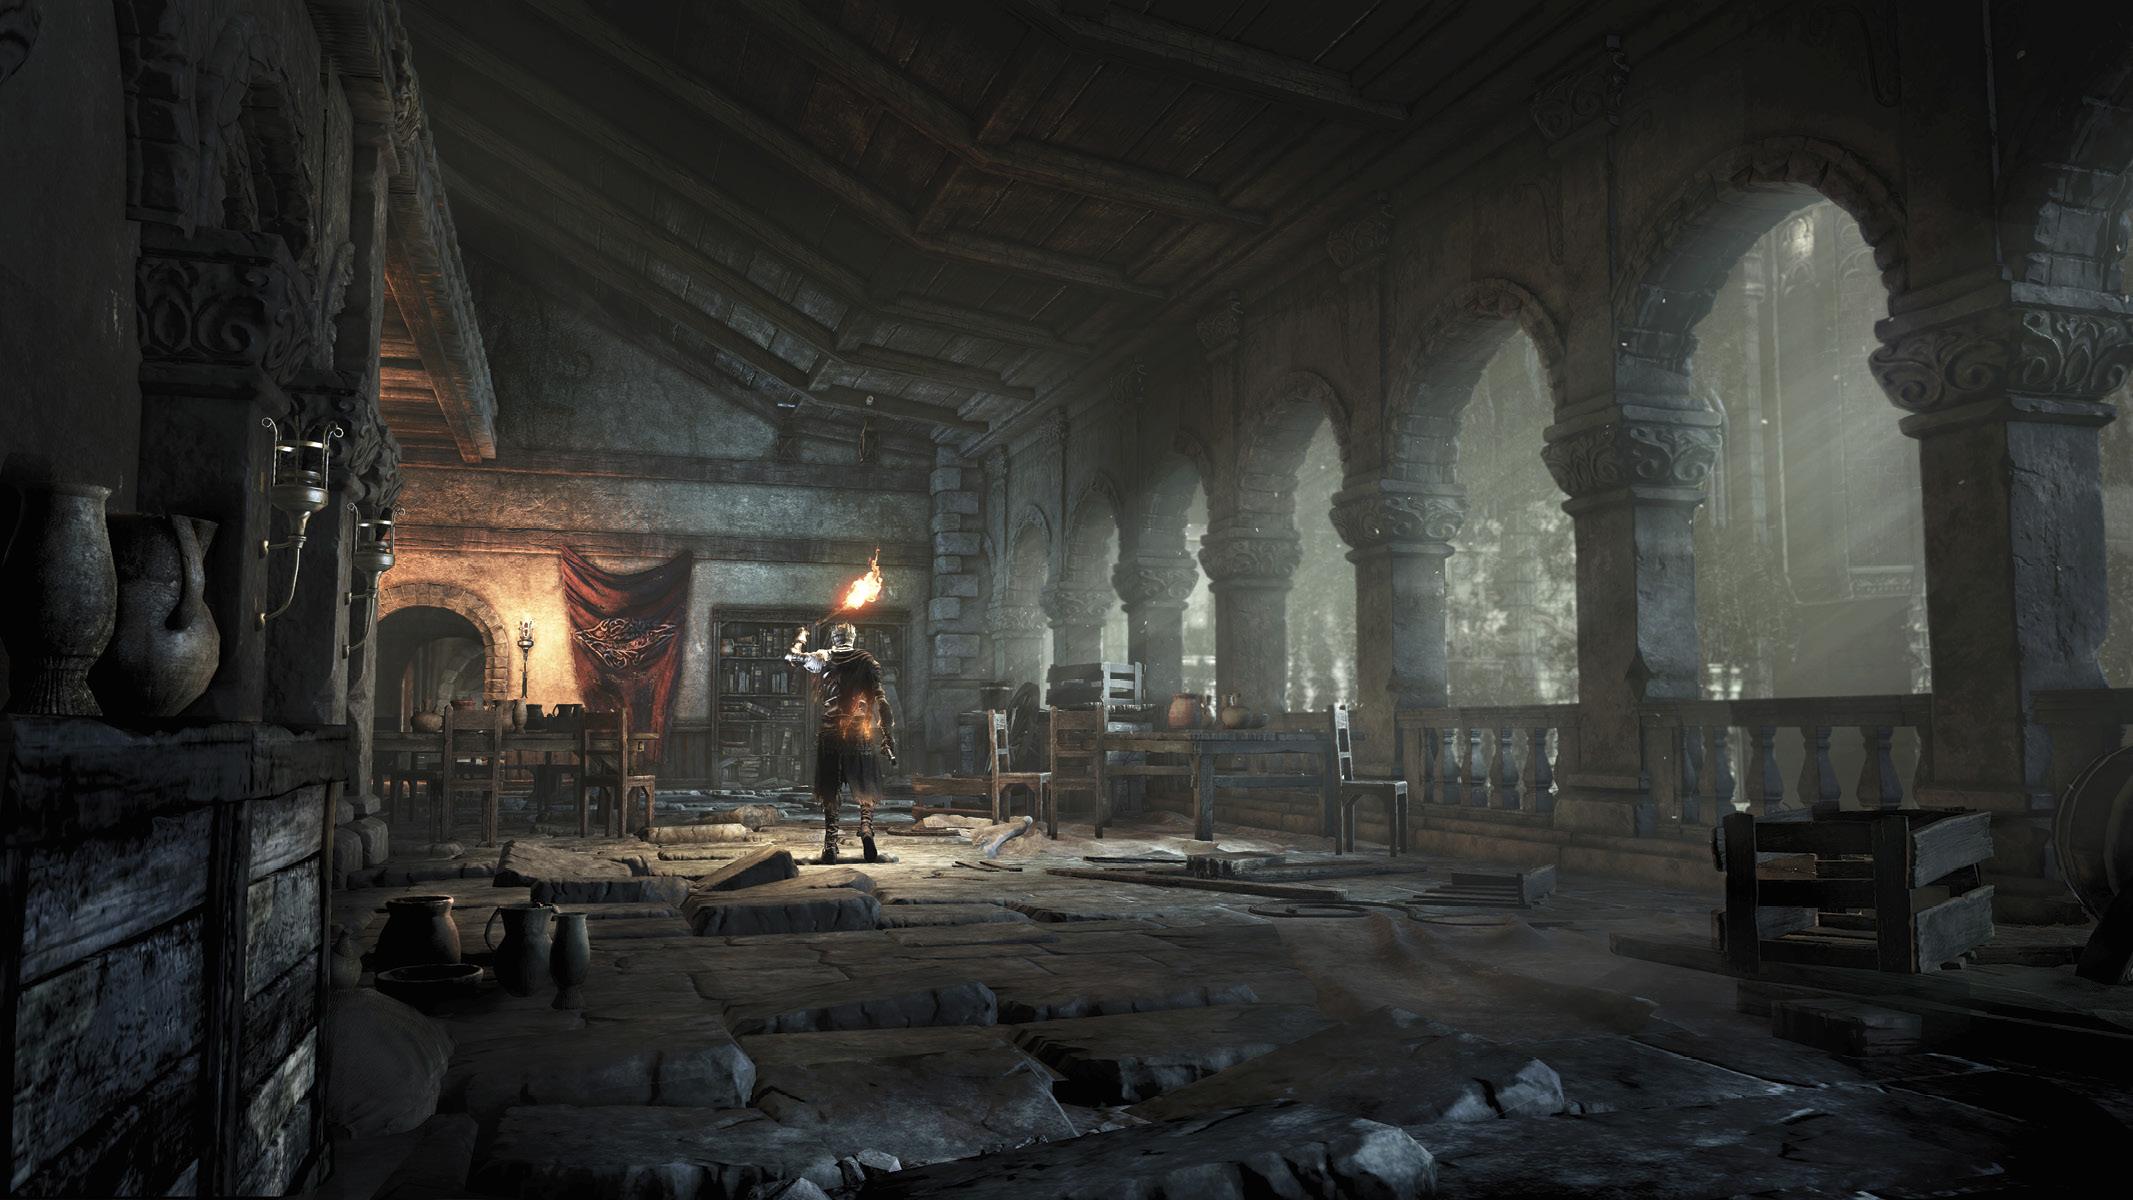 A World Of Ash Cinders Introduction Dark Souls Iii Eguide Prima Games Yoel est un pèlerin, venu sur les terres de lothric en compagnie d'autres membres de son culte dans le seul but d'y mourir. dark souls iii